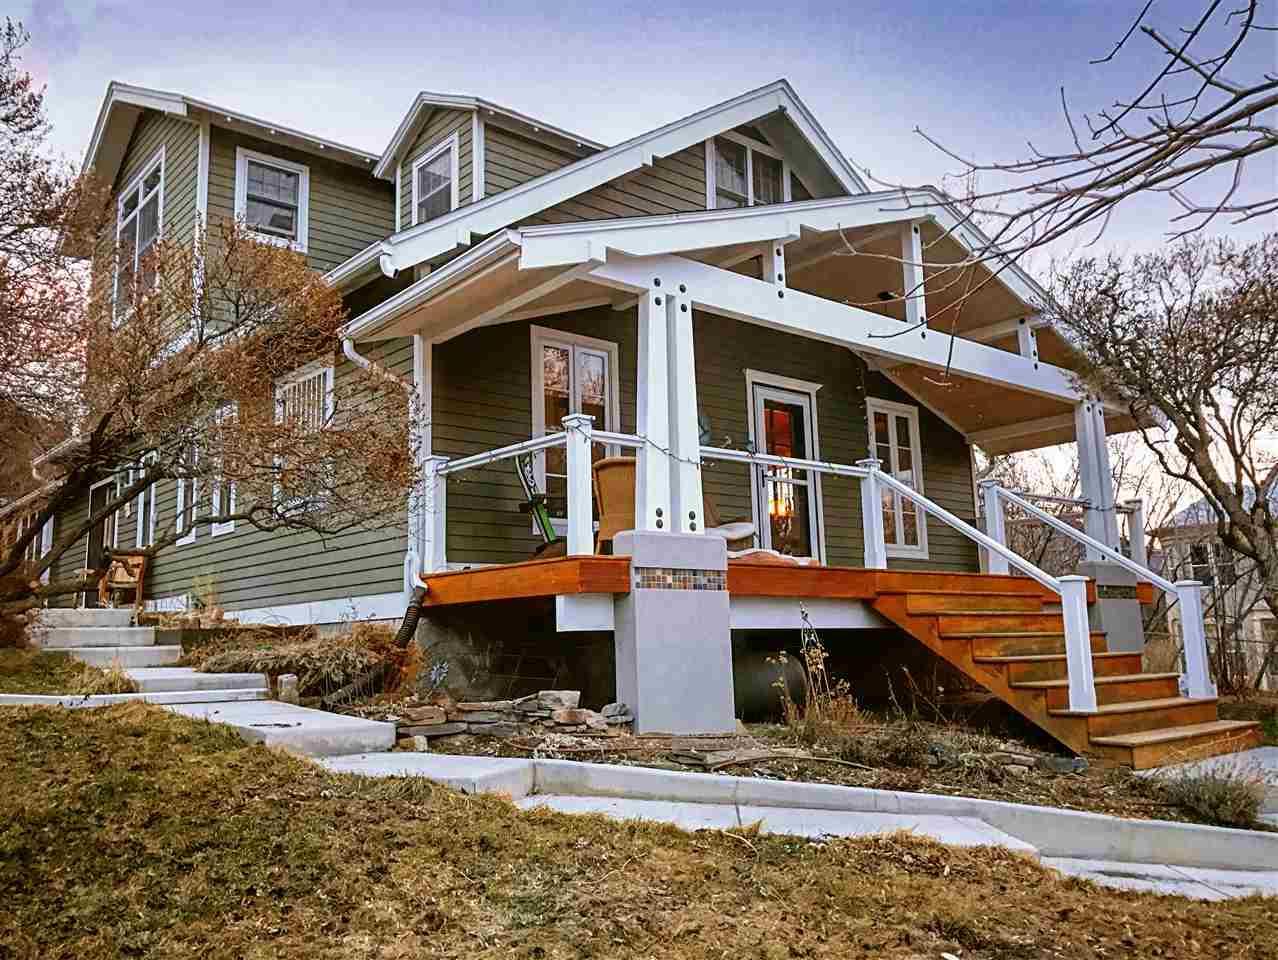 102 S Benton, Helena, MT - USA (photo 1)